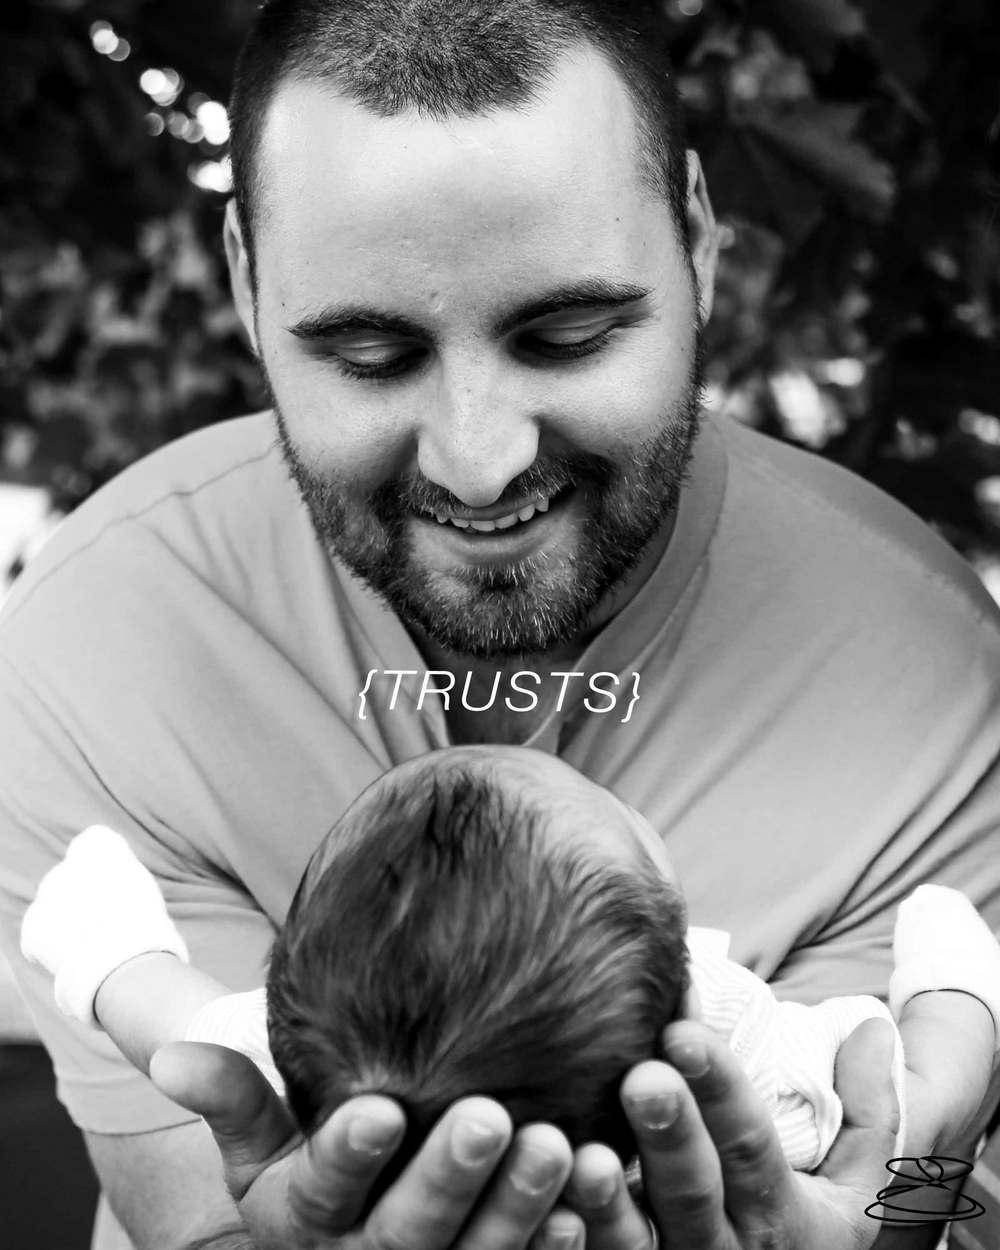 Trusts-Just Joy Imaging